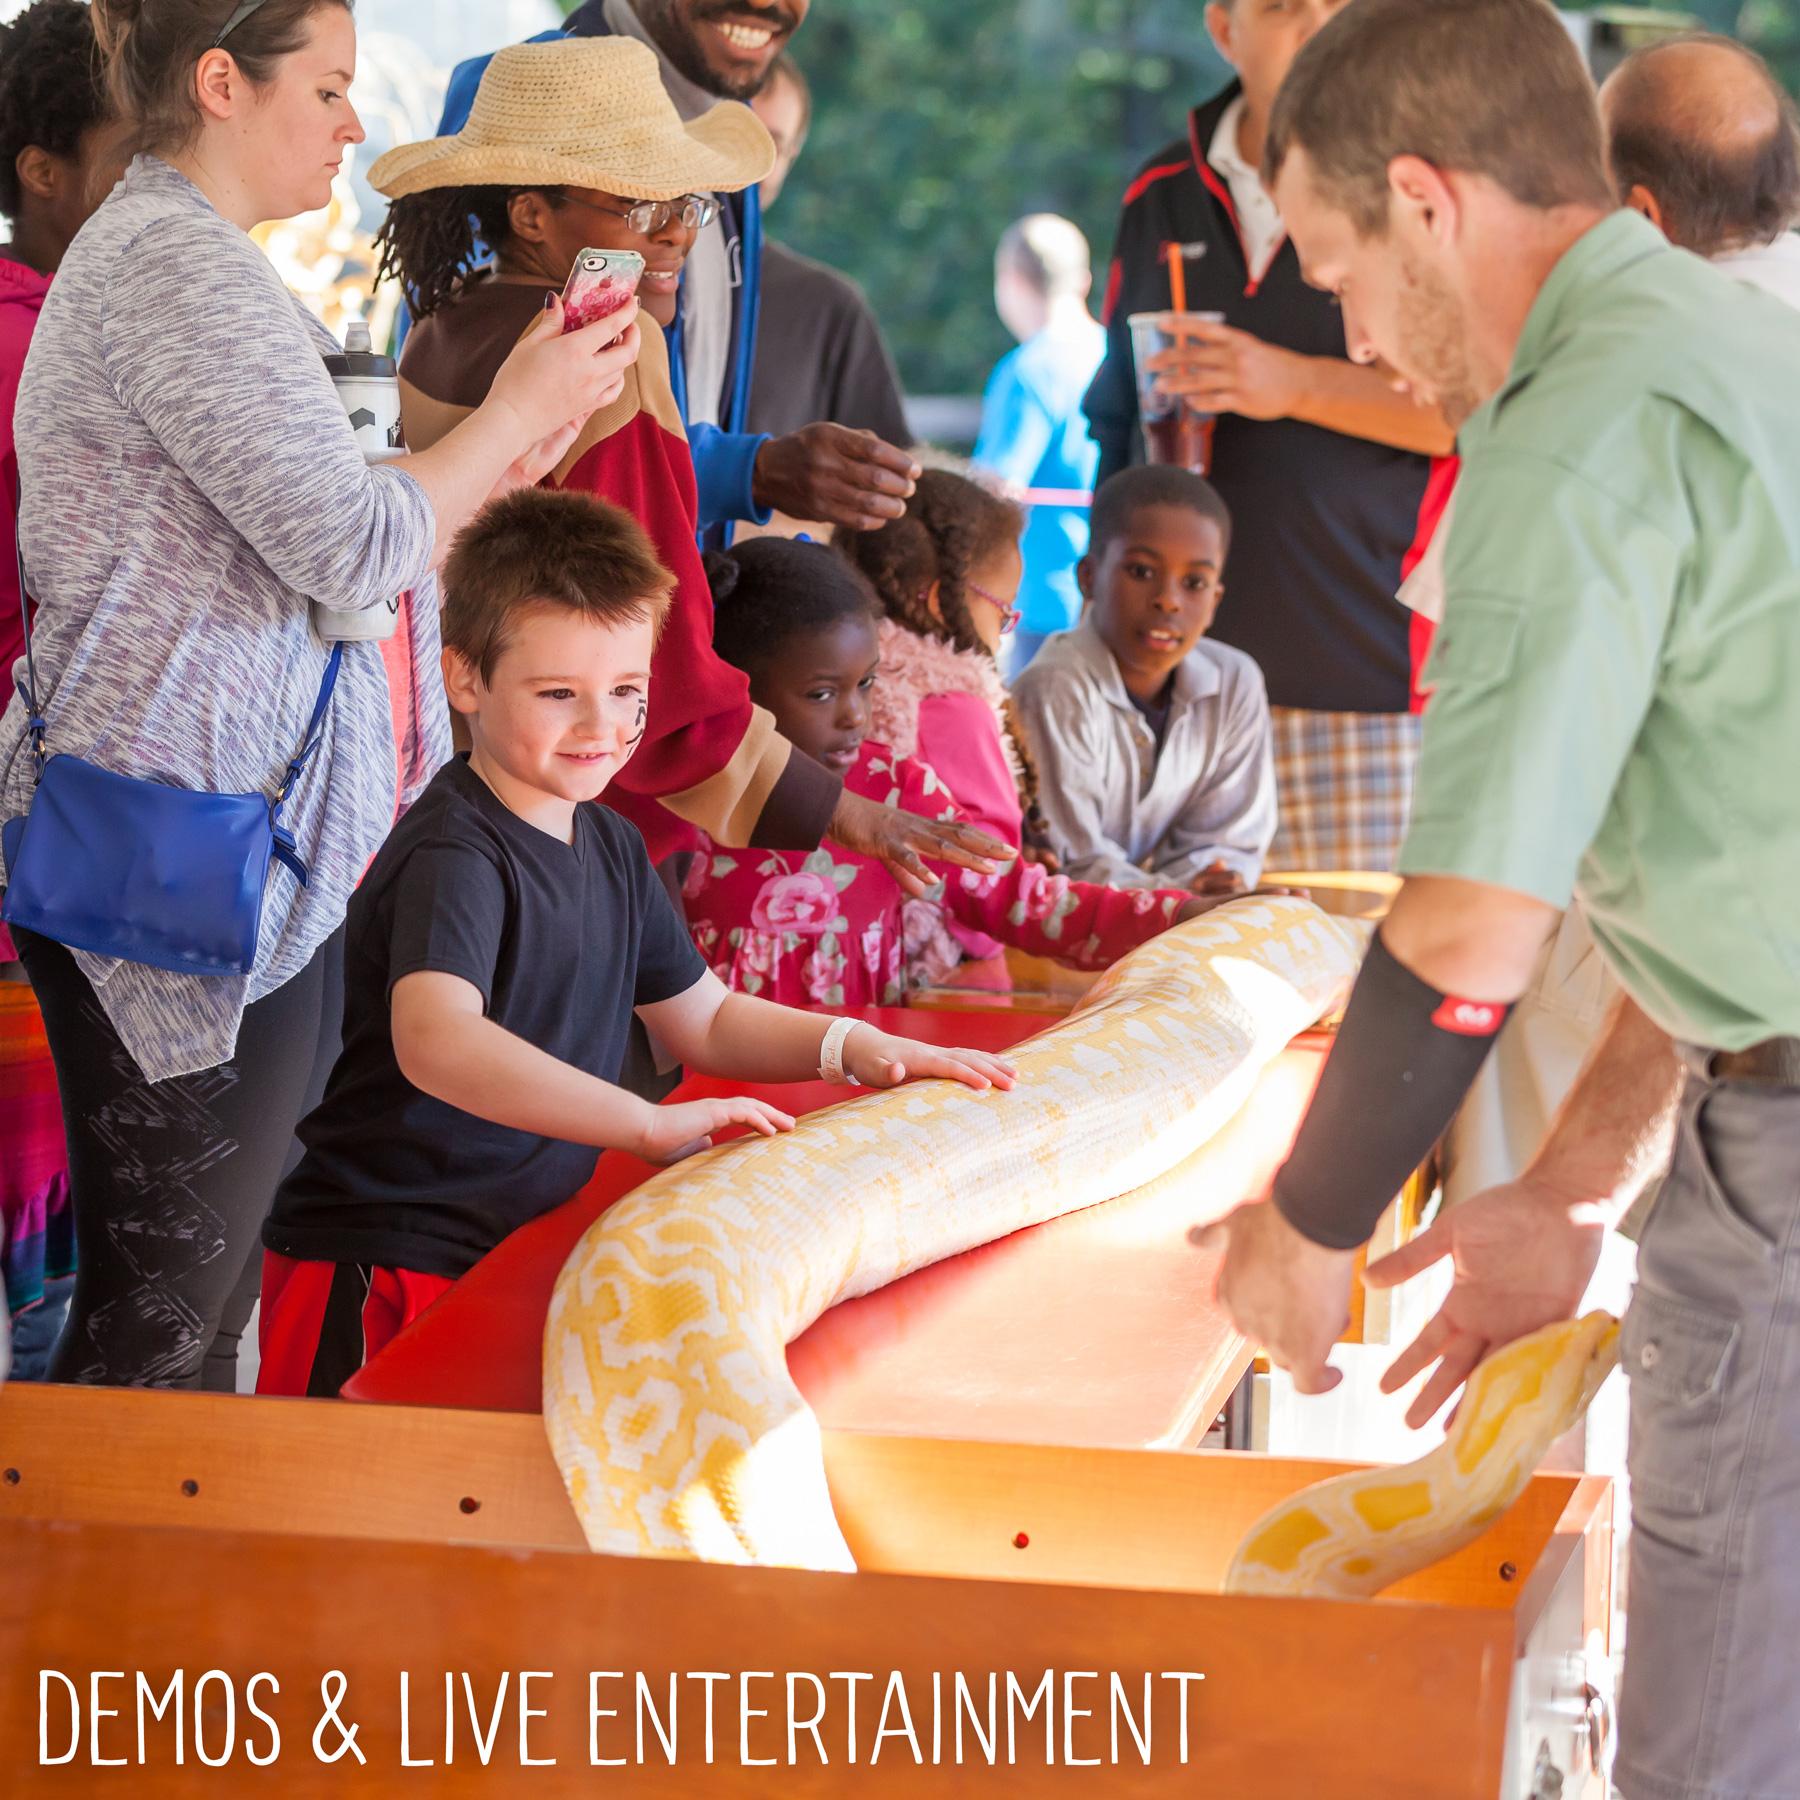 Demos Live Entertainment Homestead Gardens Inc Homestead Gardens Inc